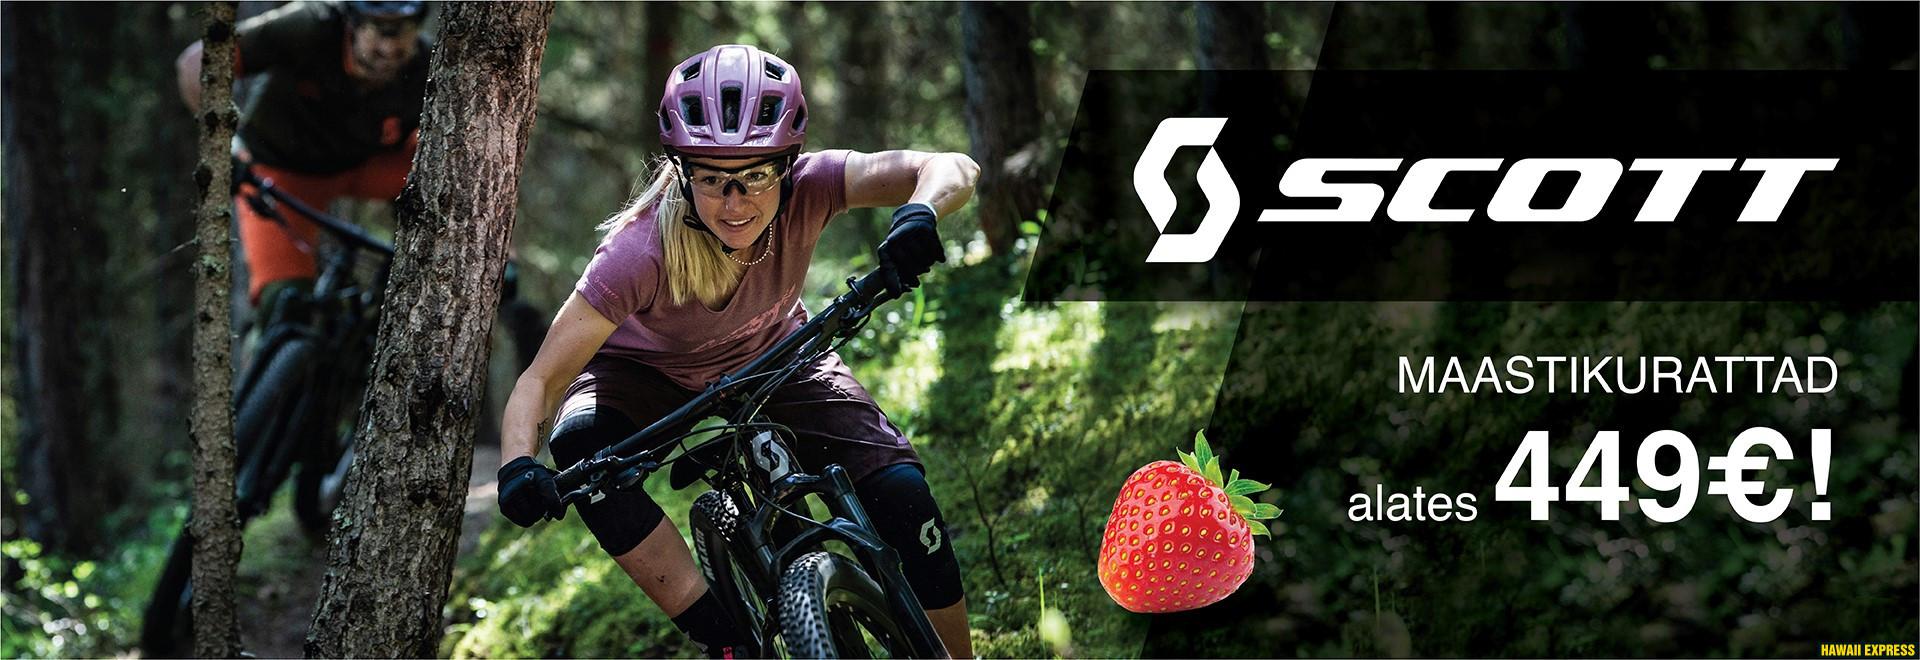 Scott maasikas